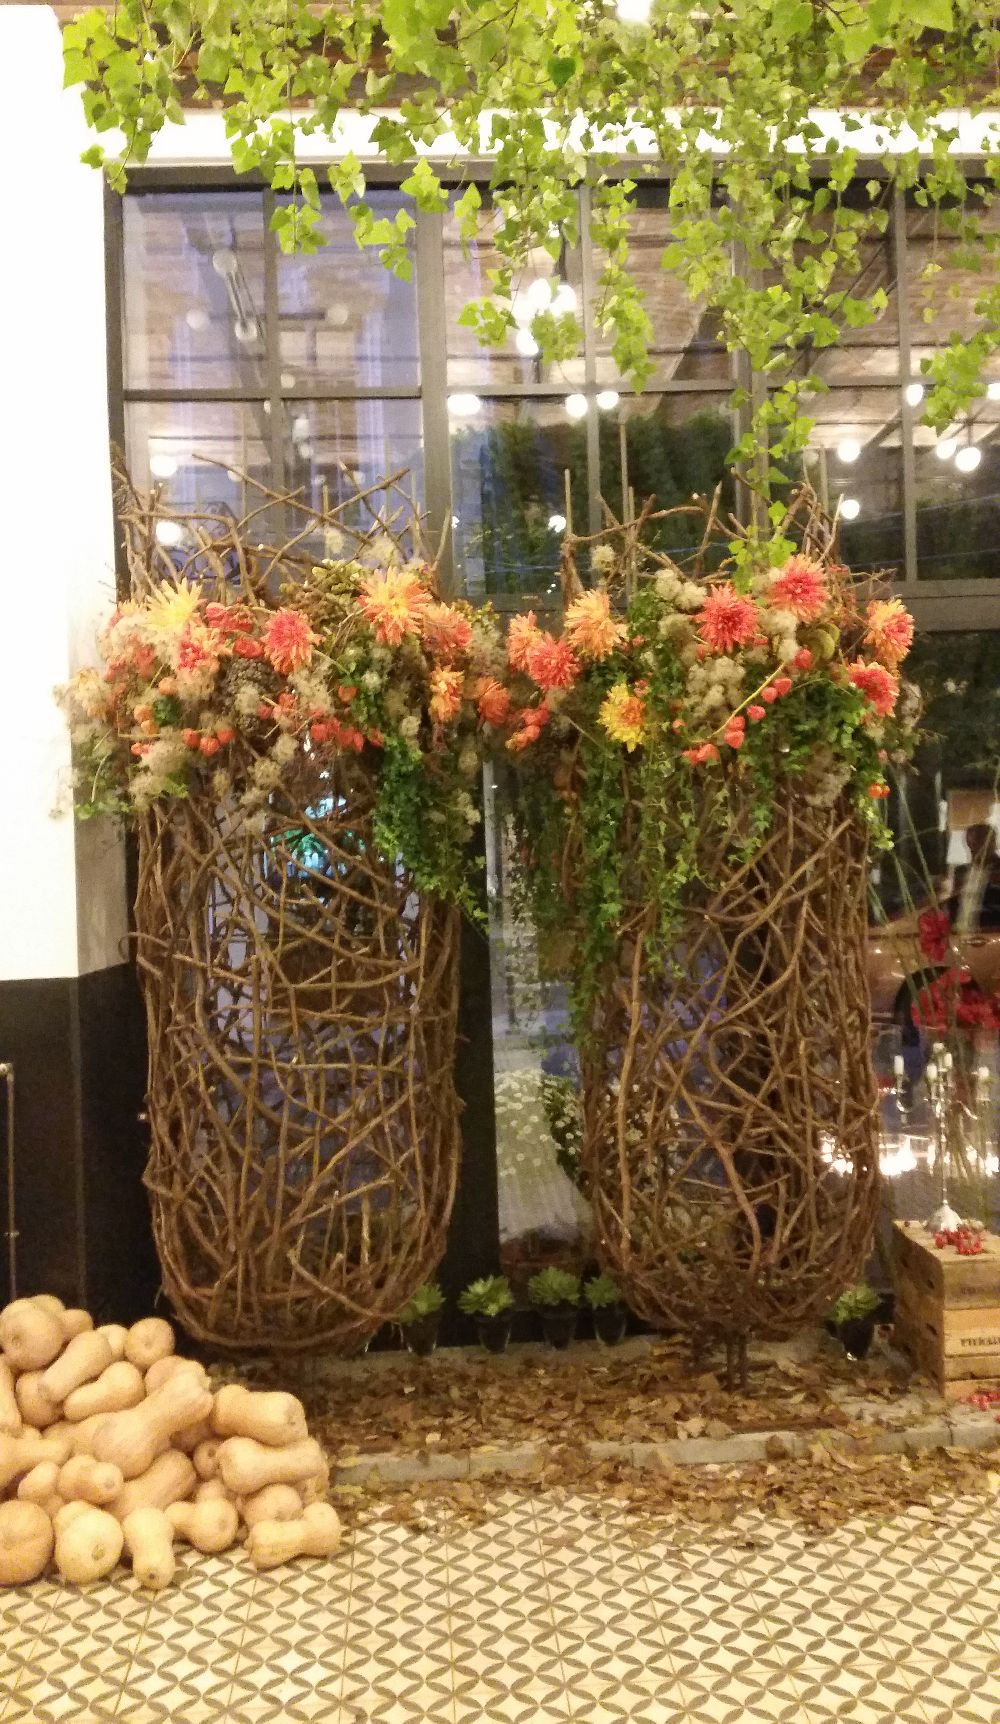 adelaparvu.com despre 45 de ani aniversare Floraria Iris, design floral Nicu Bocancea (47)